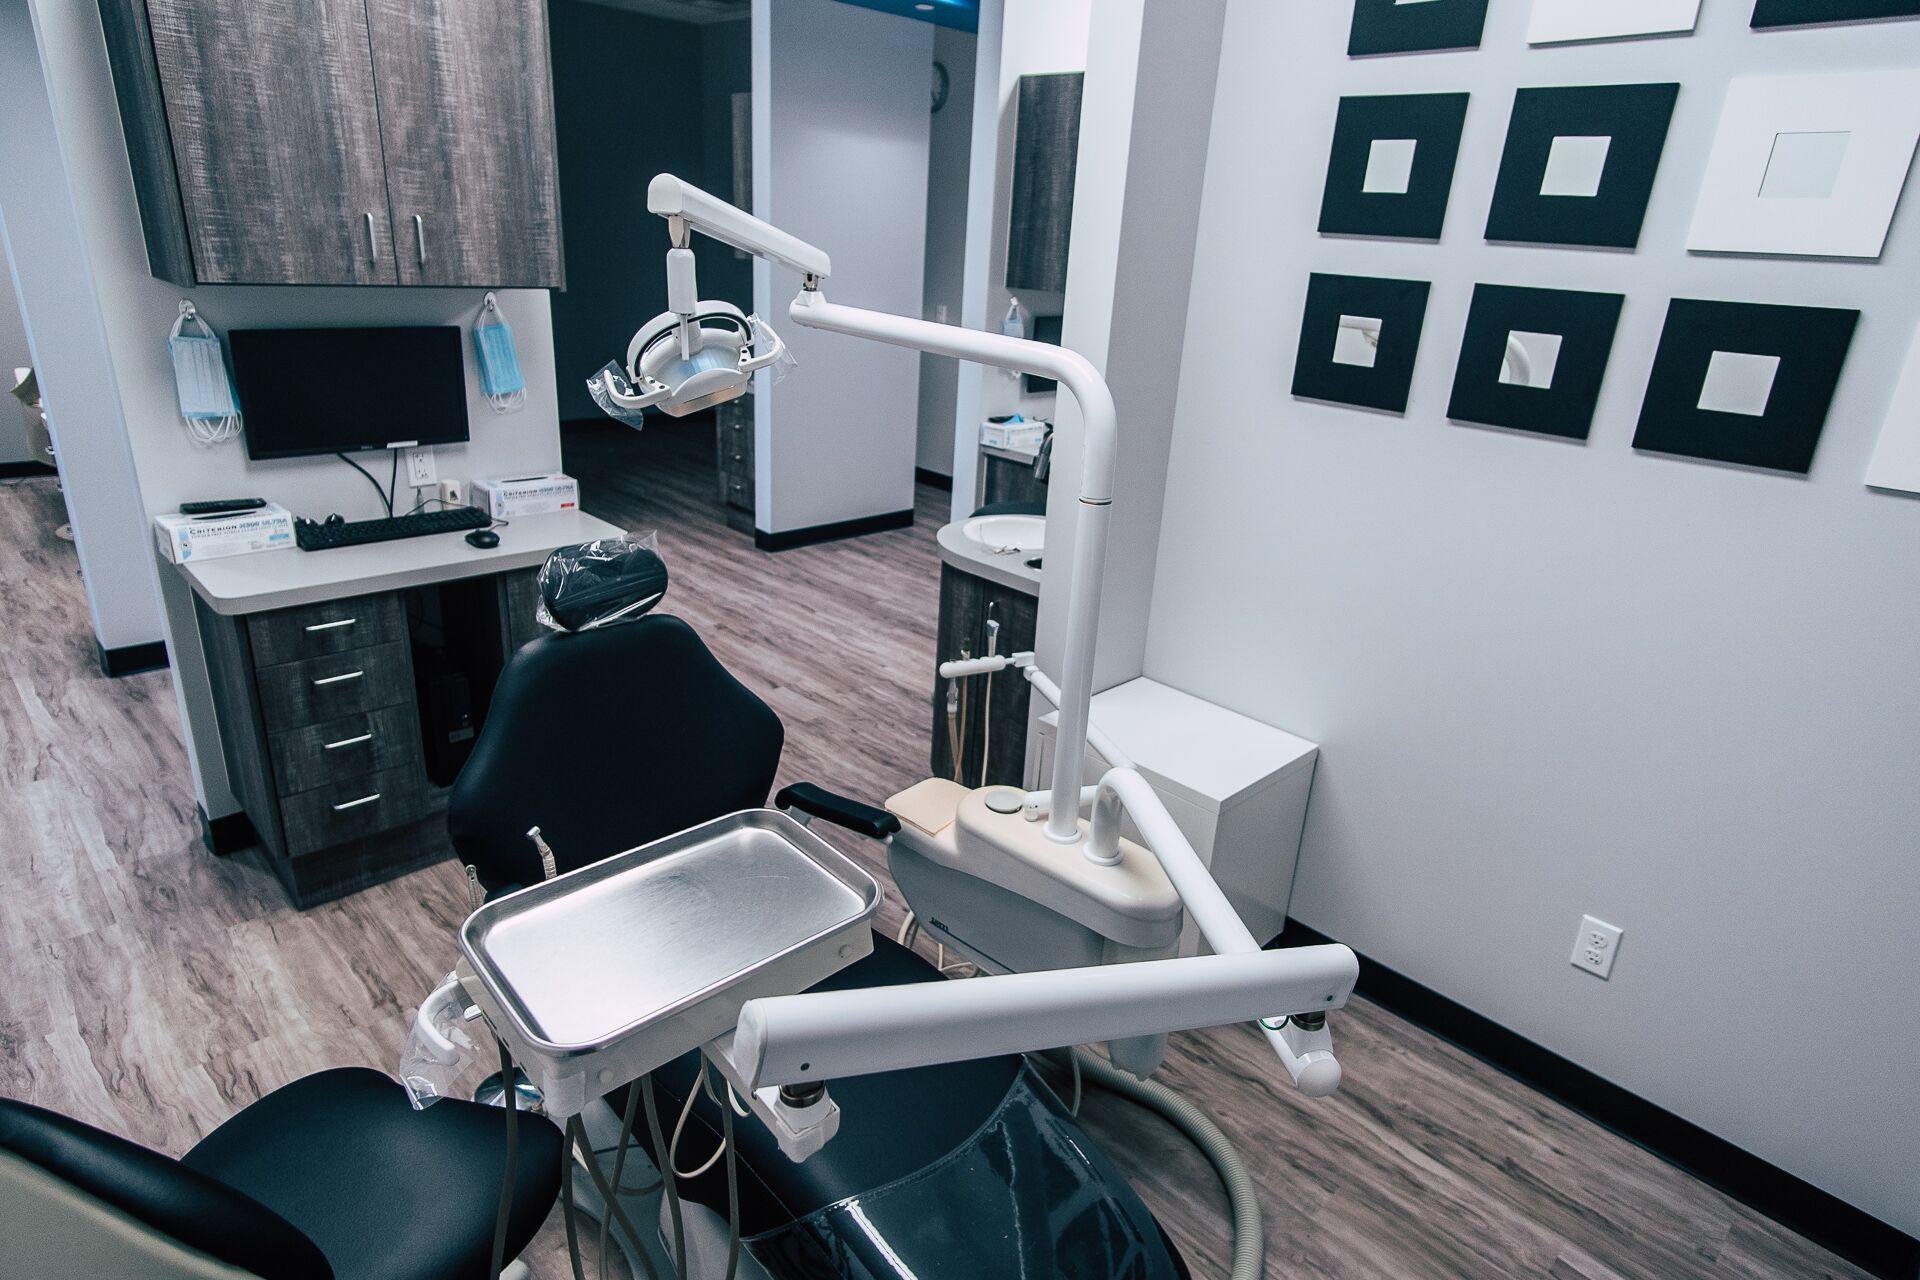 Dental Ben's room - Dentist in Peoria, AZ 85383